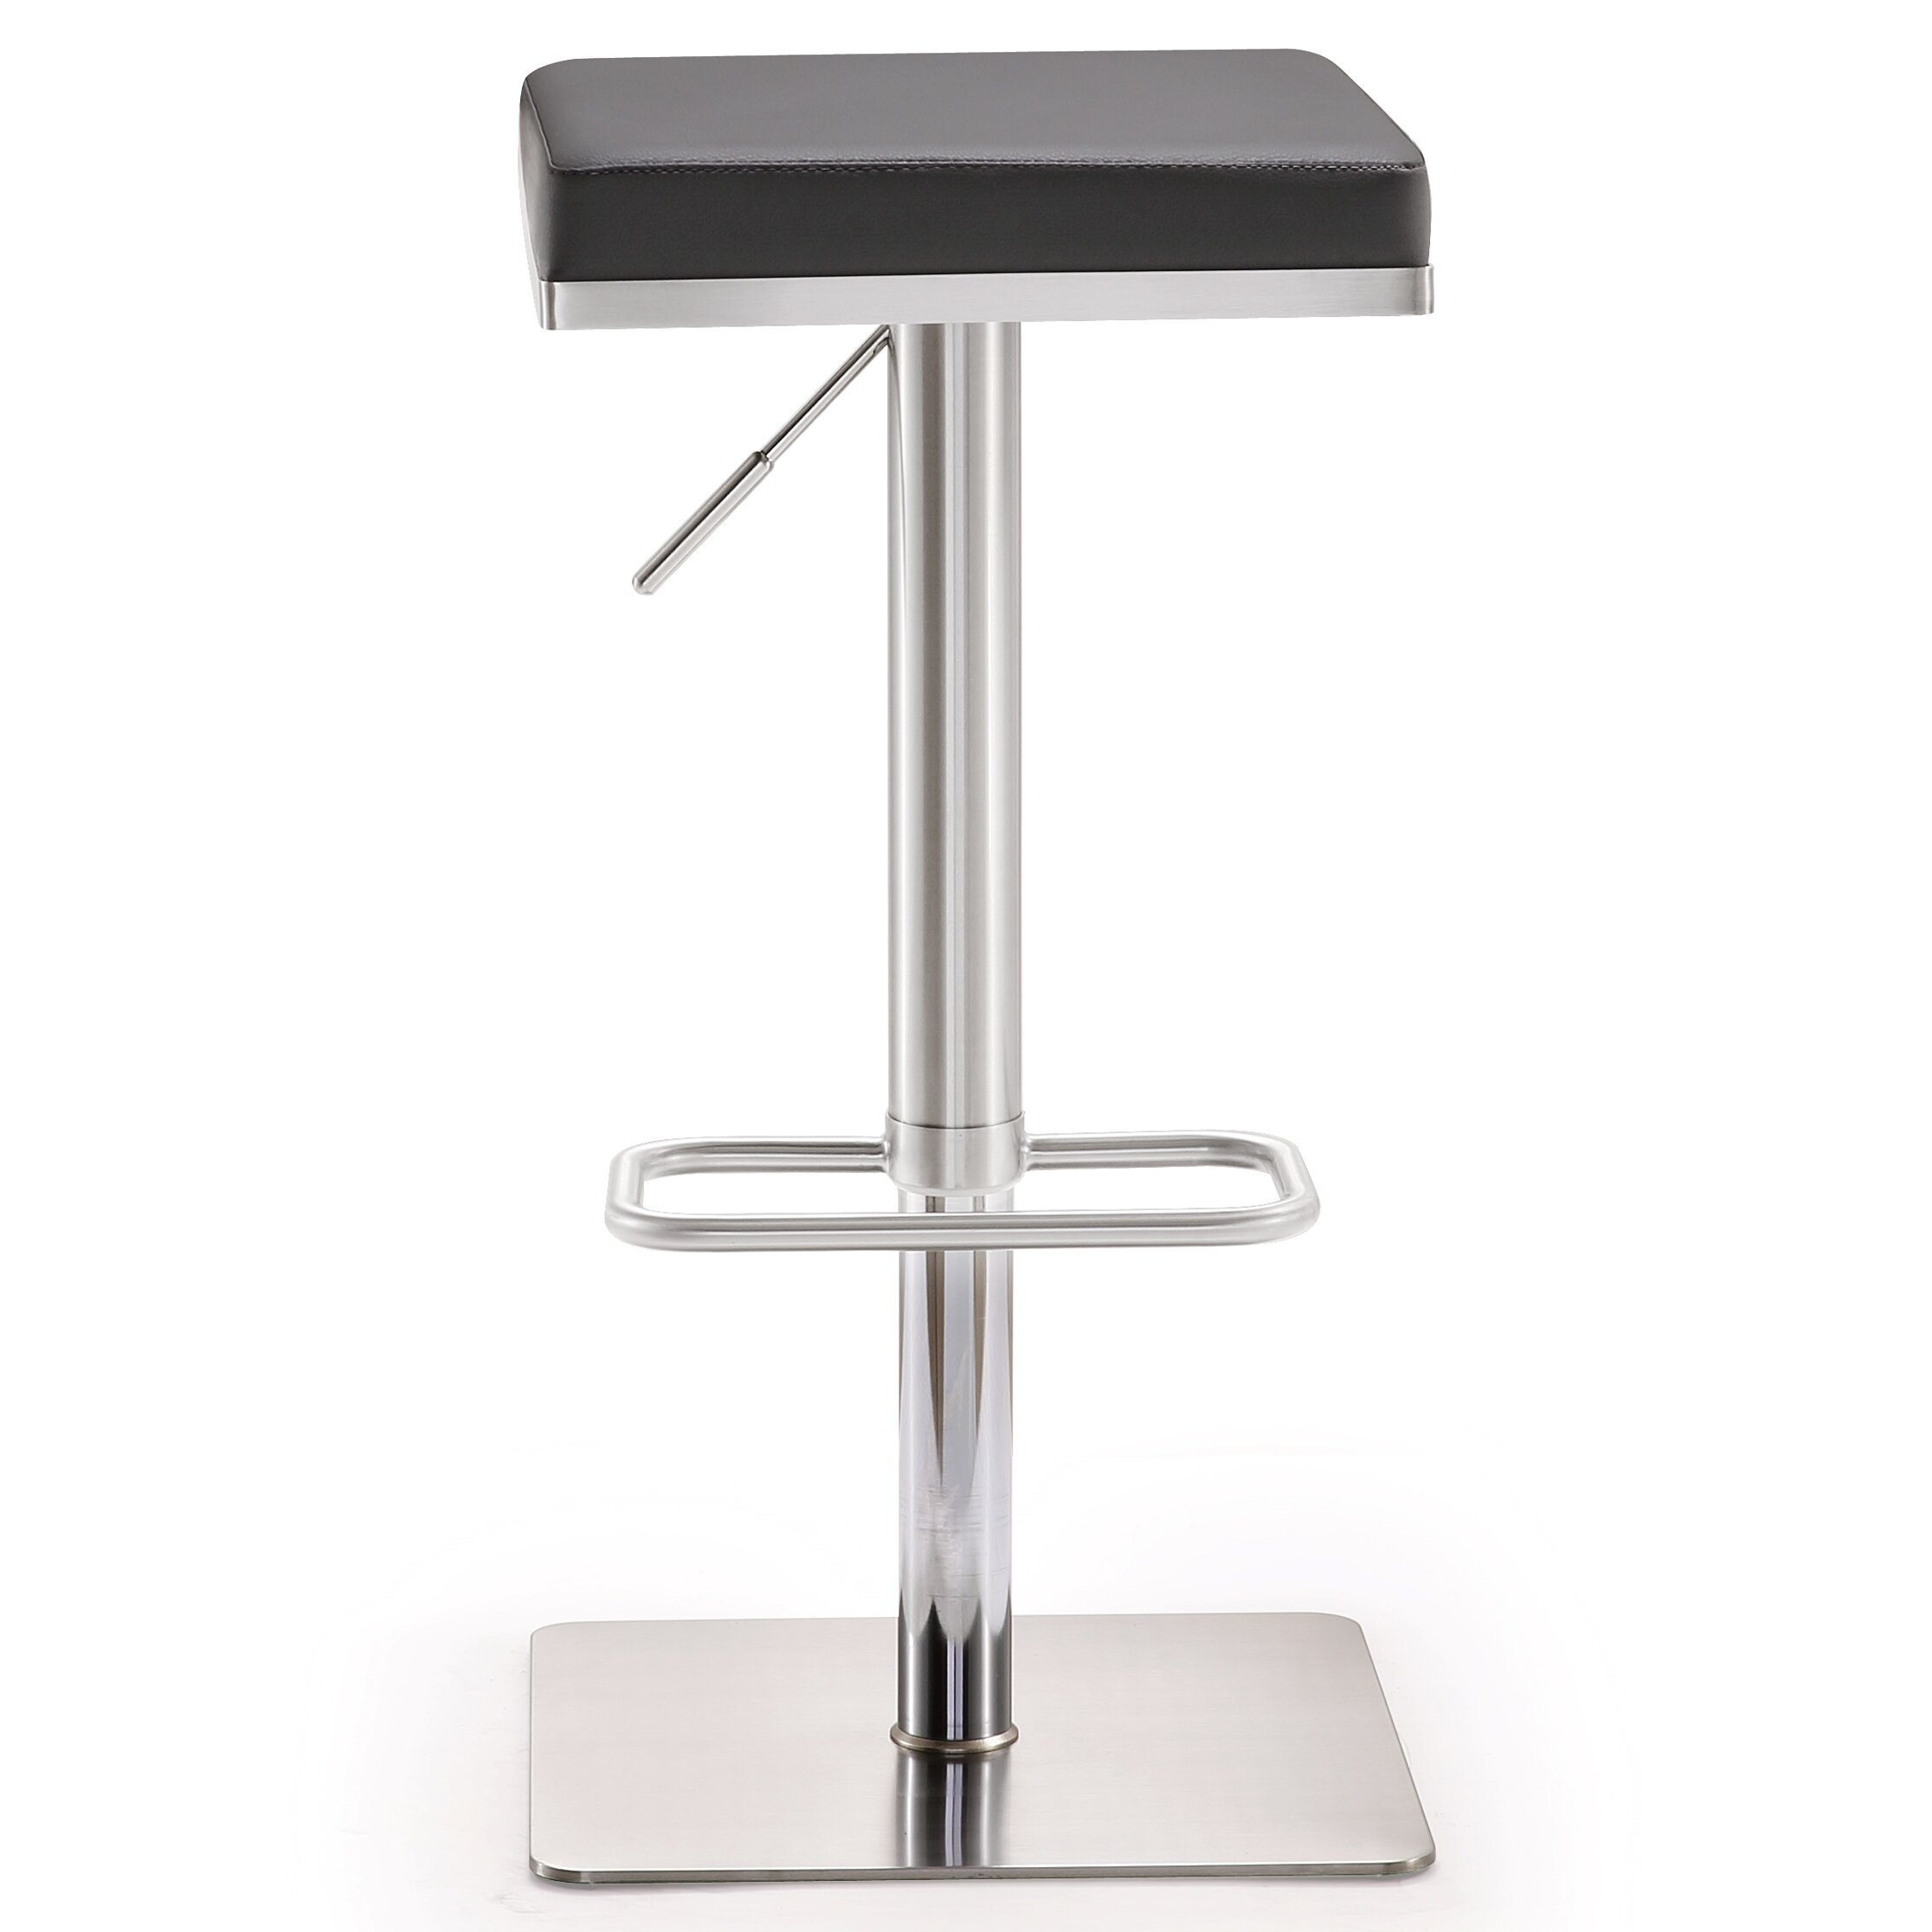 TOV Bari Adjustable Height Swivel Bar Stool with Cushion  : Bari Adjustable Height Swivel Bar Stool with Cushion TOV K362 from www.wayfair.com size 2232 x 2232 jpeg 213kB